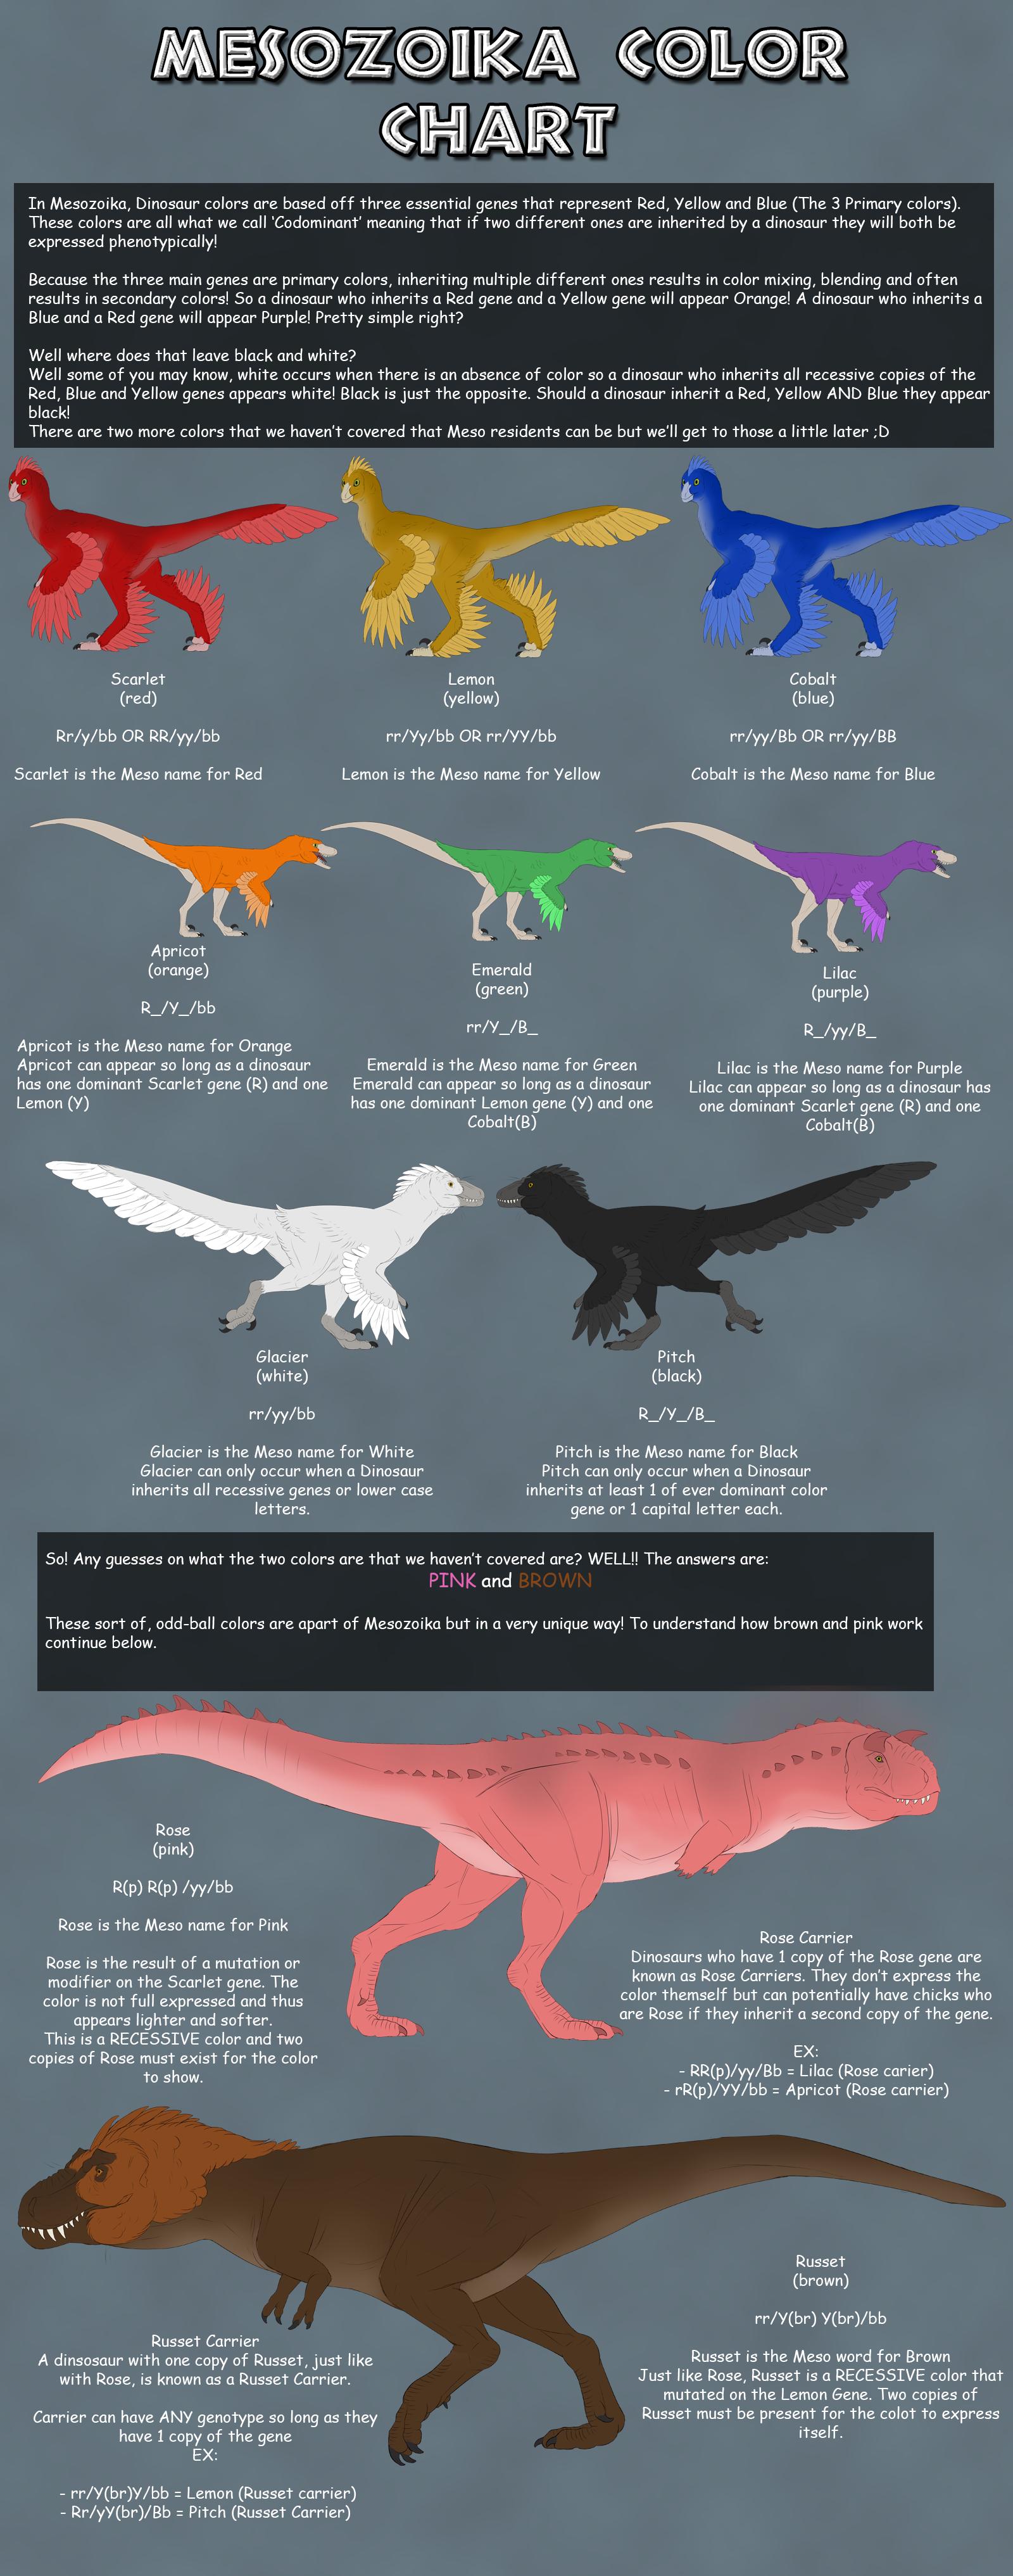 Mesozoika Color Chart